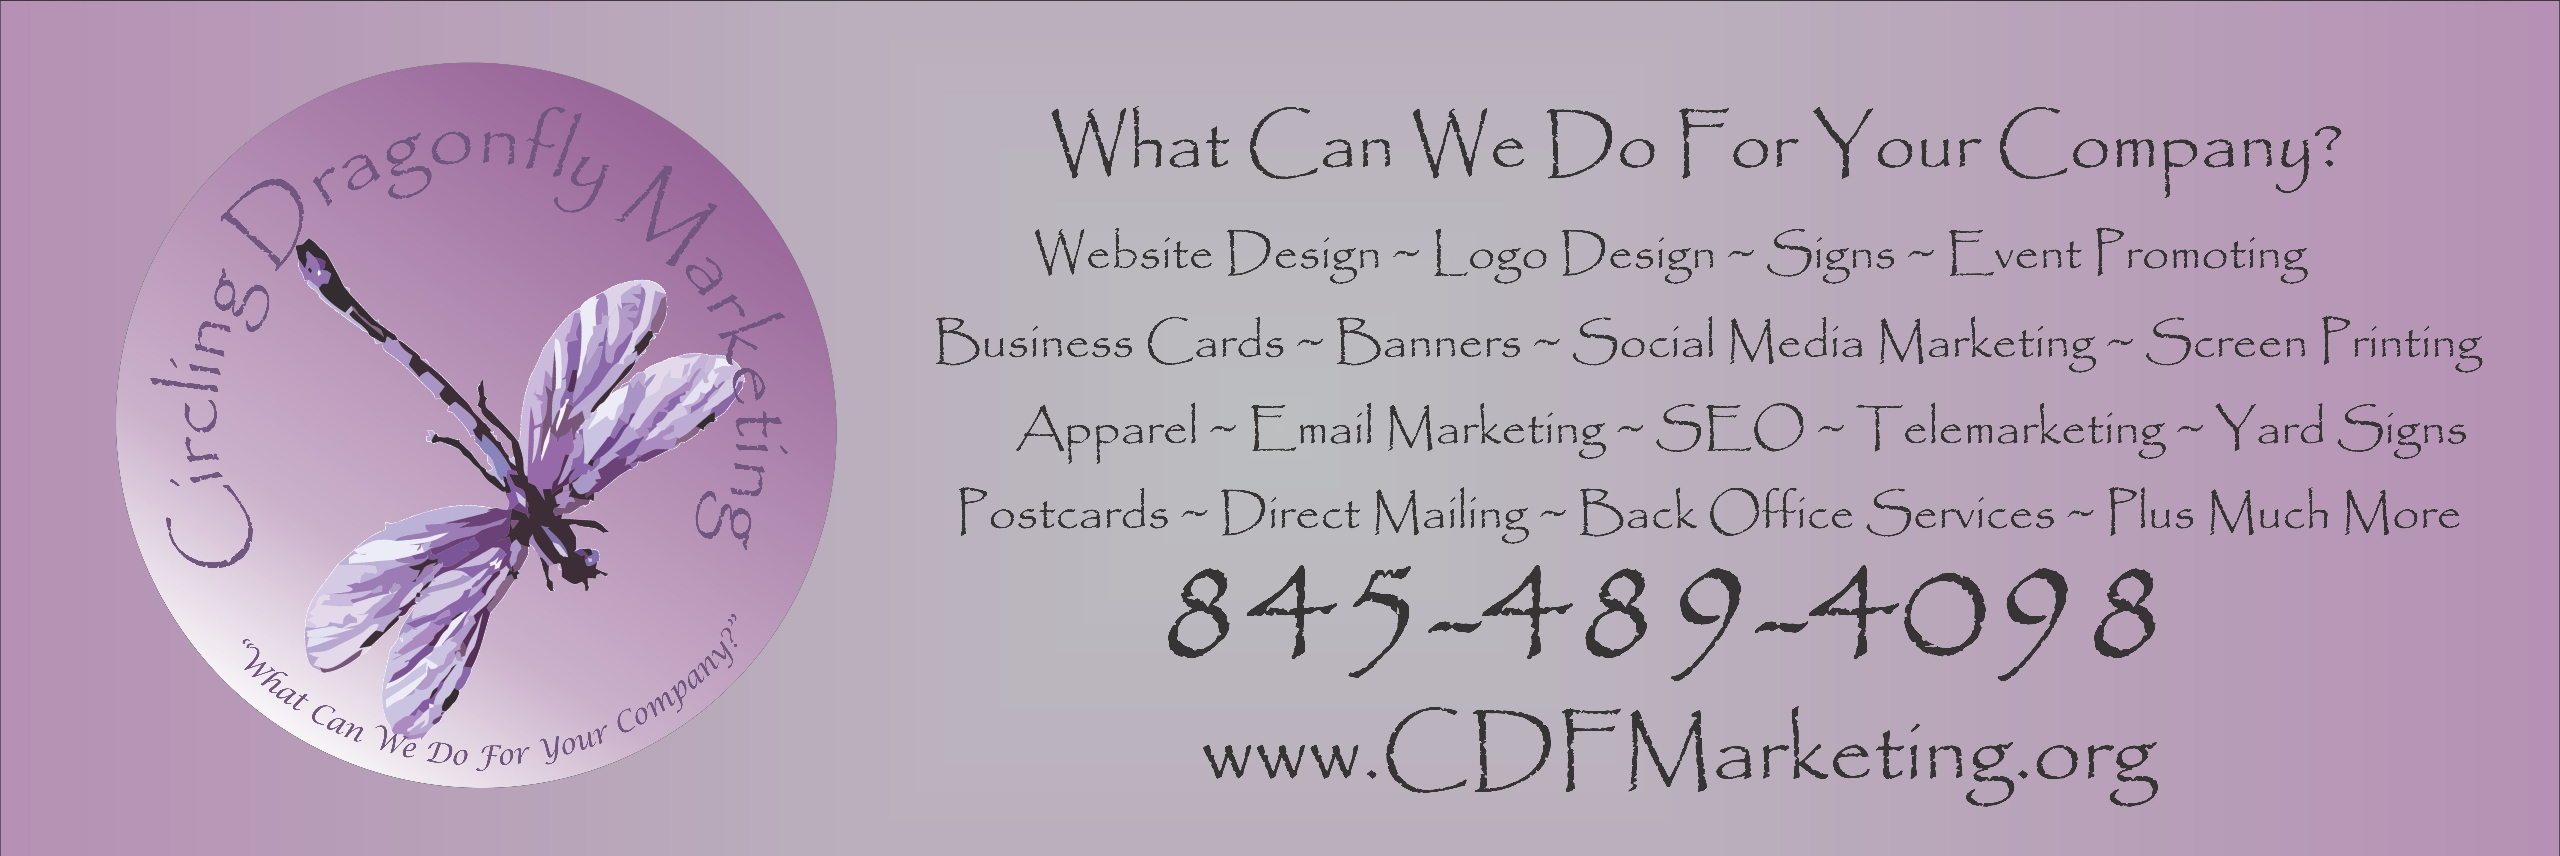 cdfmarketing (@cdfmarketing) Cover Image